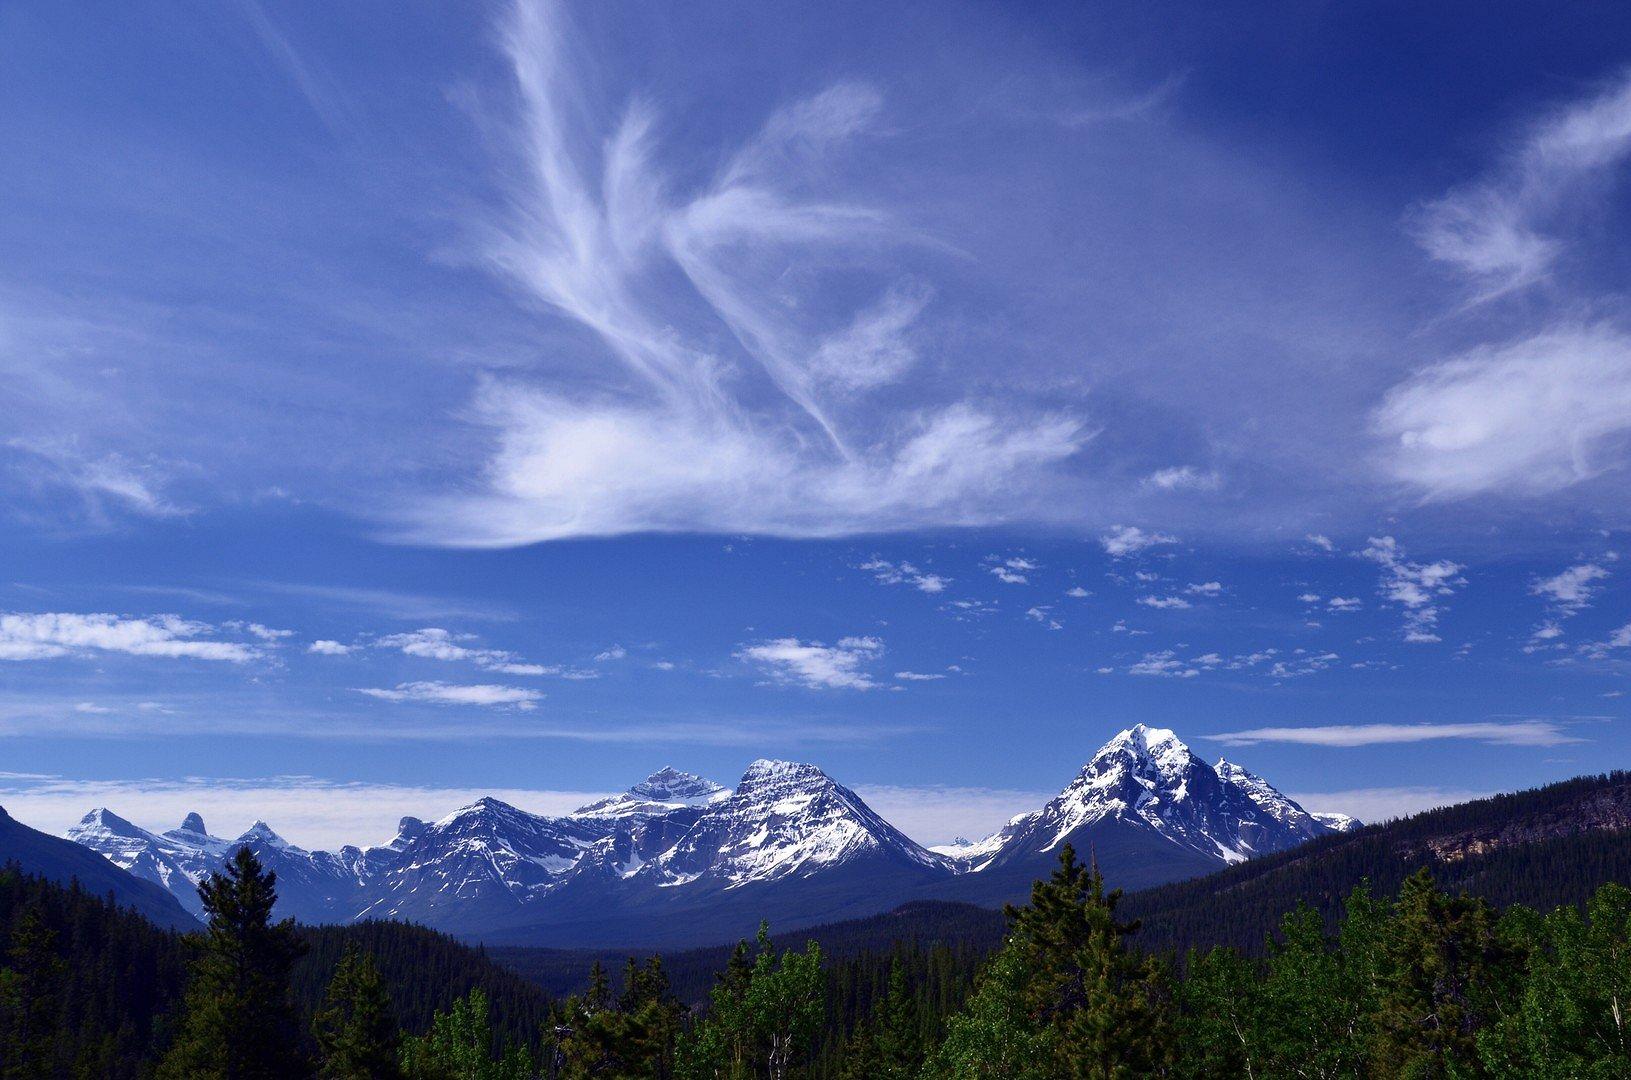 Mt. Edith Cavell